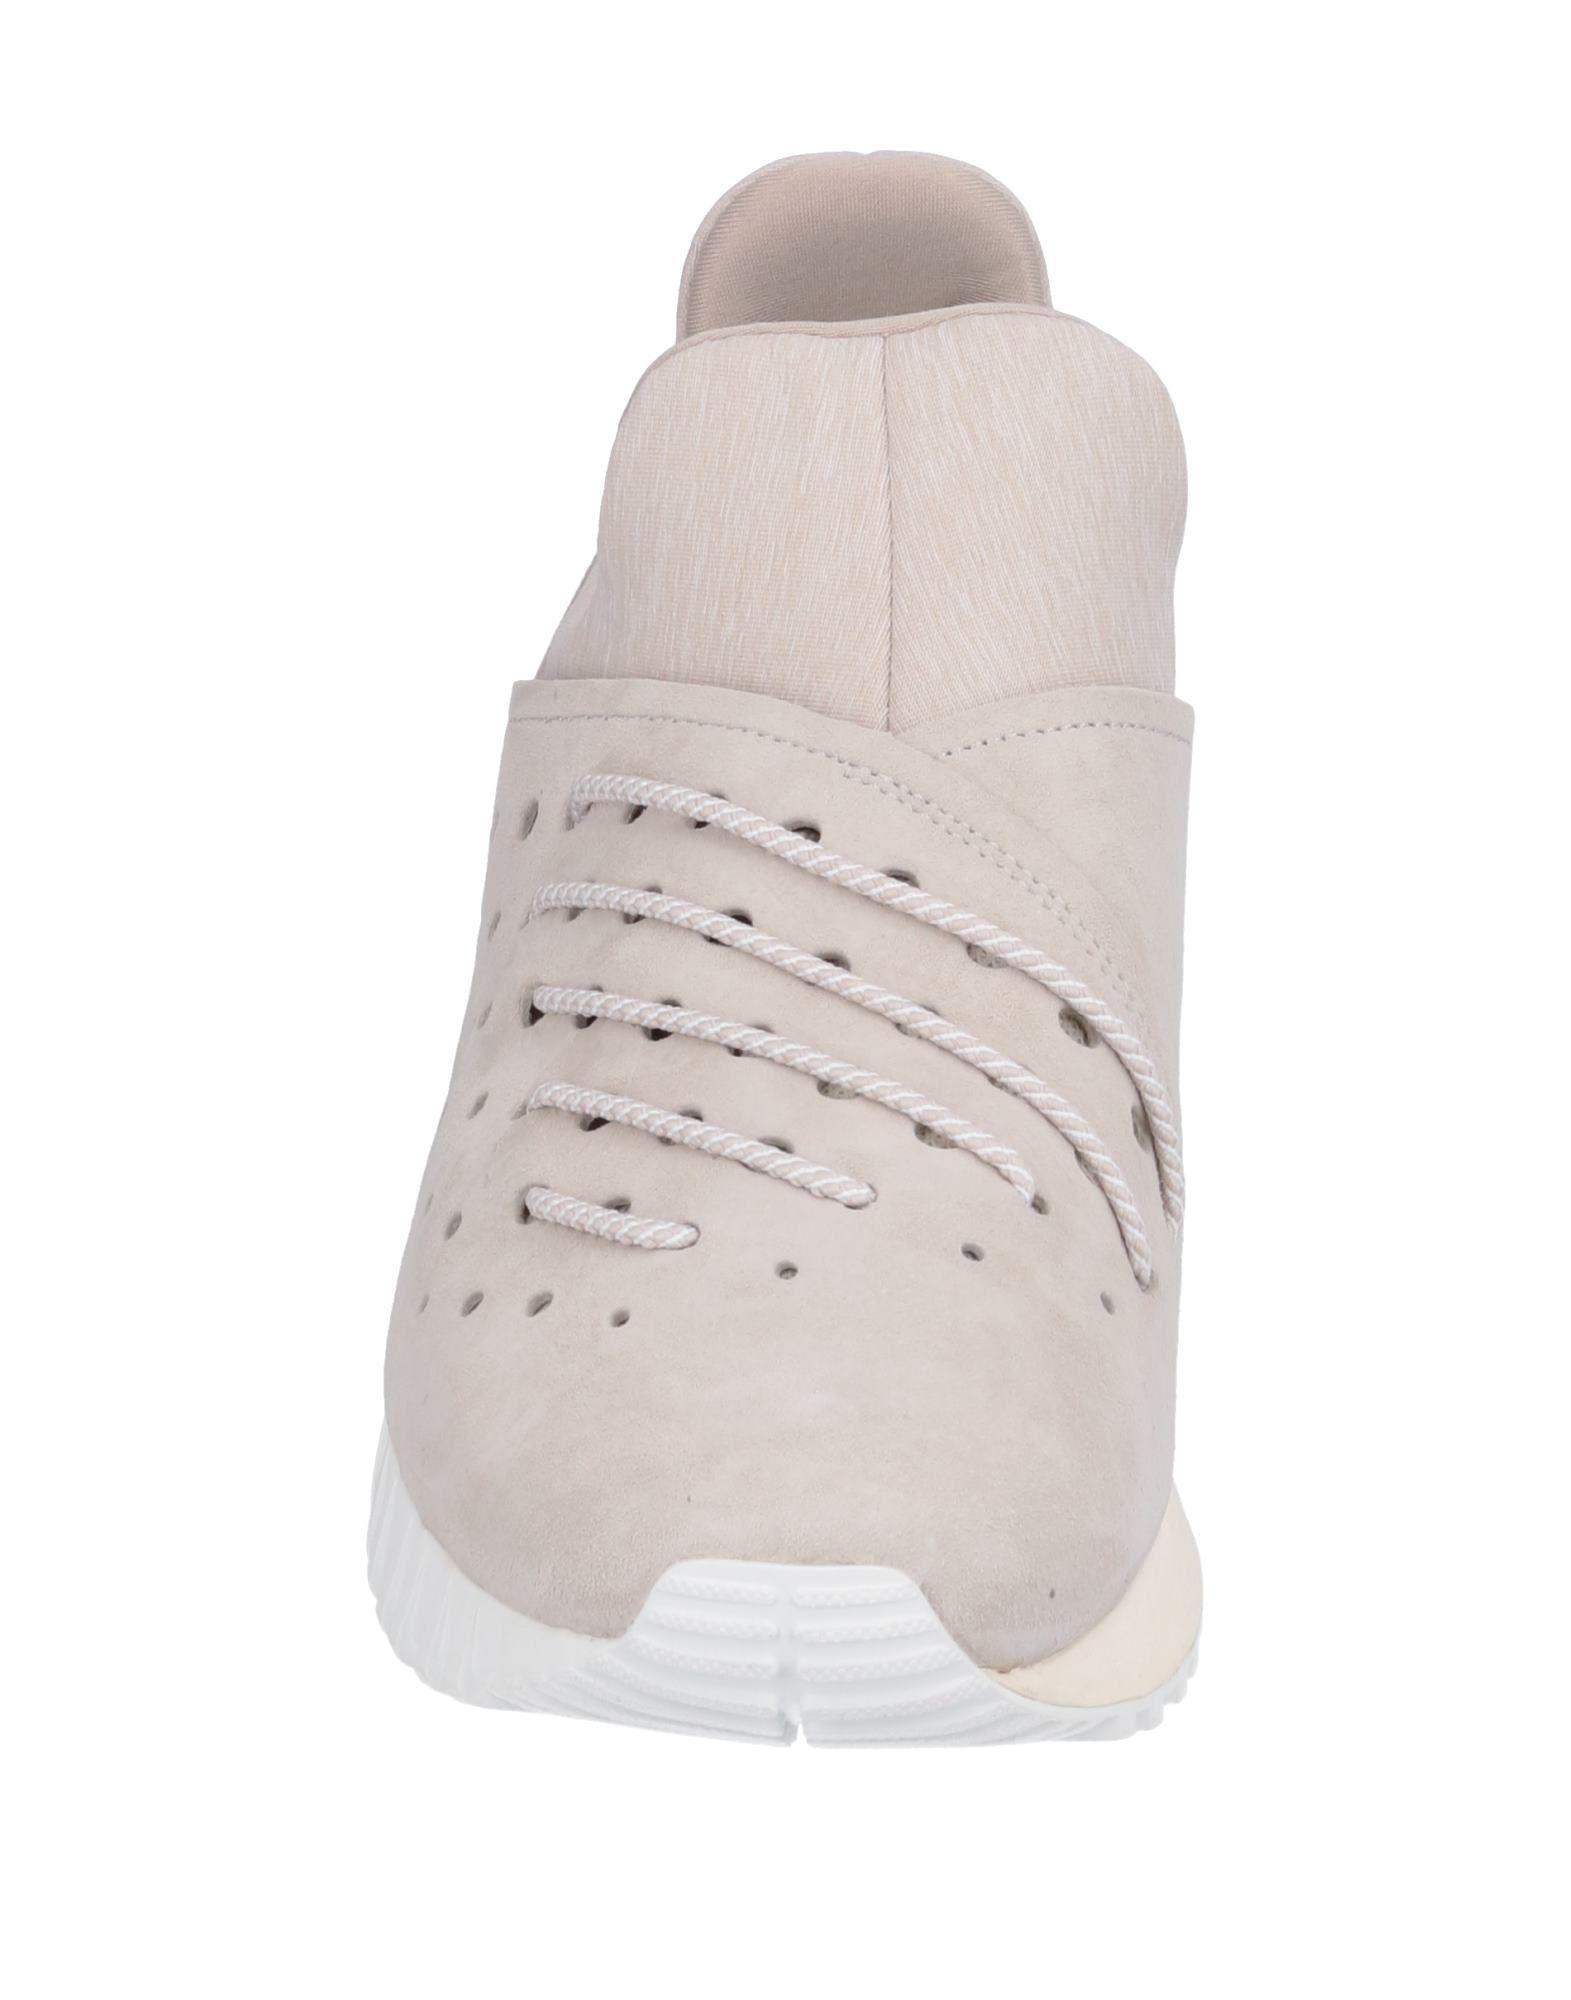 Onitsuka Tiger Sneakers - Men Onitsuka Tiger Sneakers Sneakers Sneakers online on  Australia - 11561509VK da7352